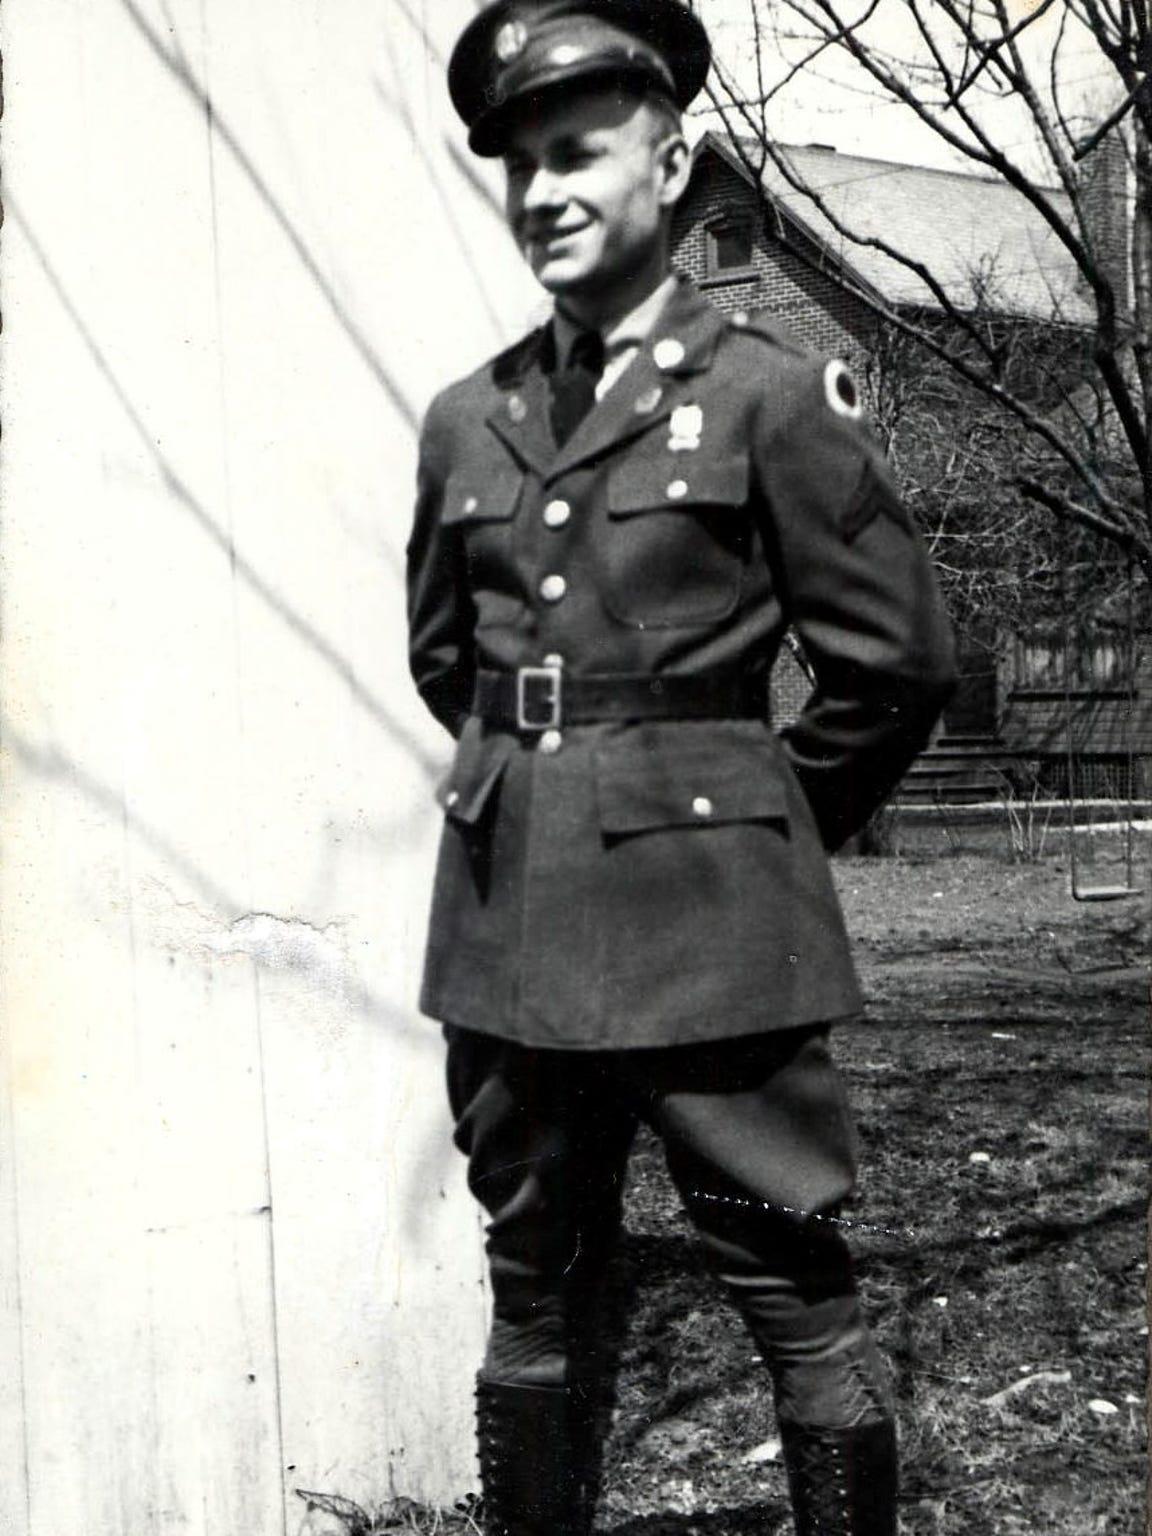 Jim McGrady, 95, served as a flight instructor during World War II.